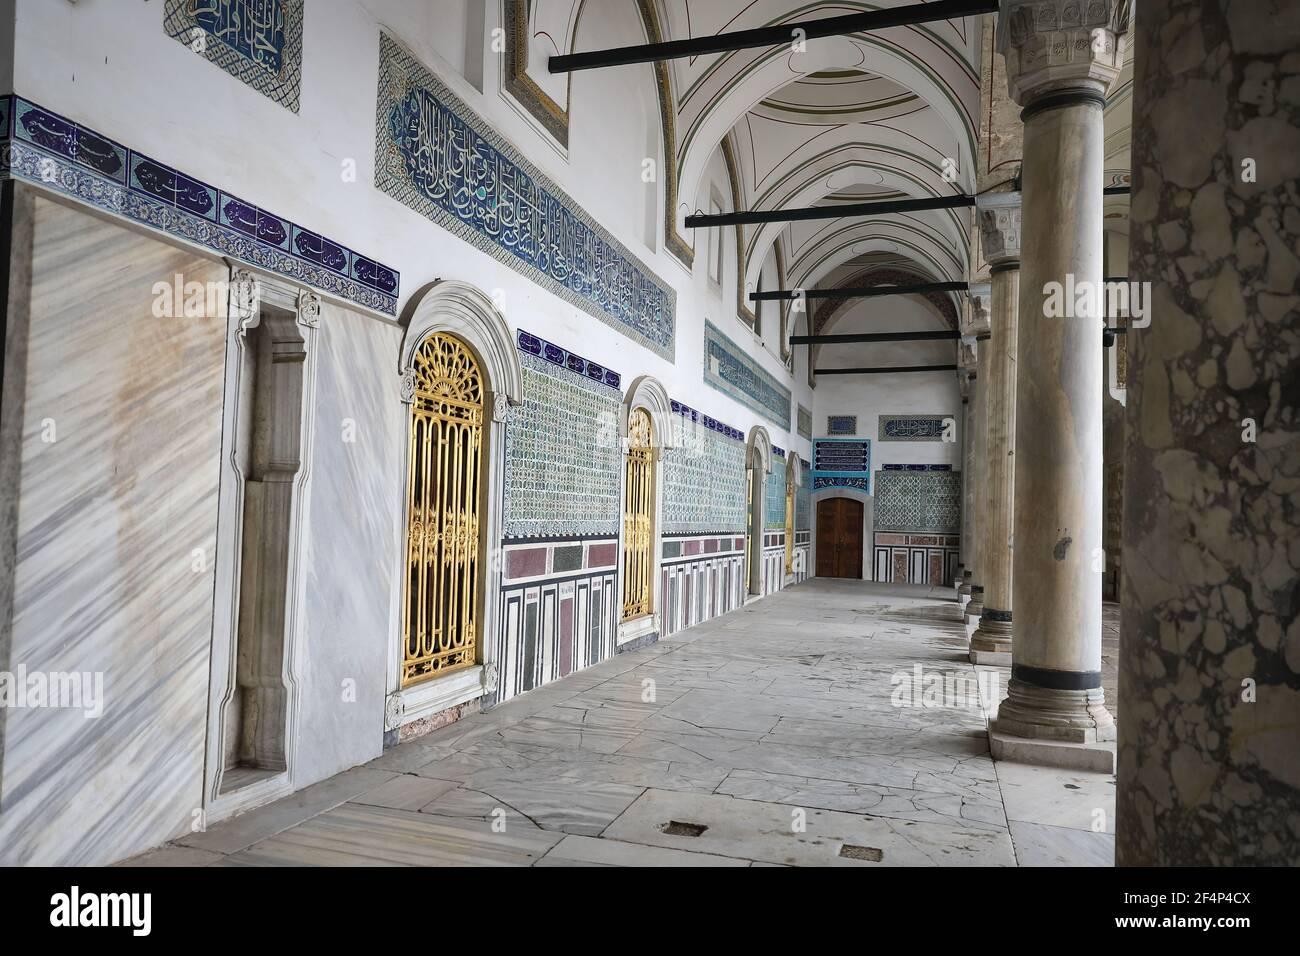 Building in Topkapi Palace, Istanbul City, Turkey Stock Photo